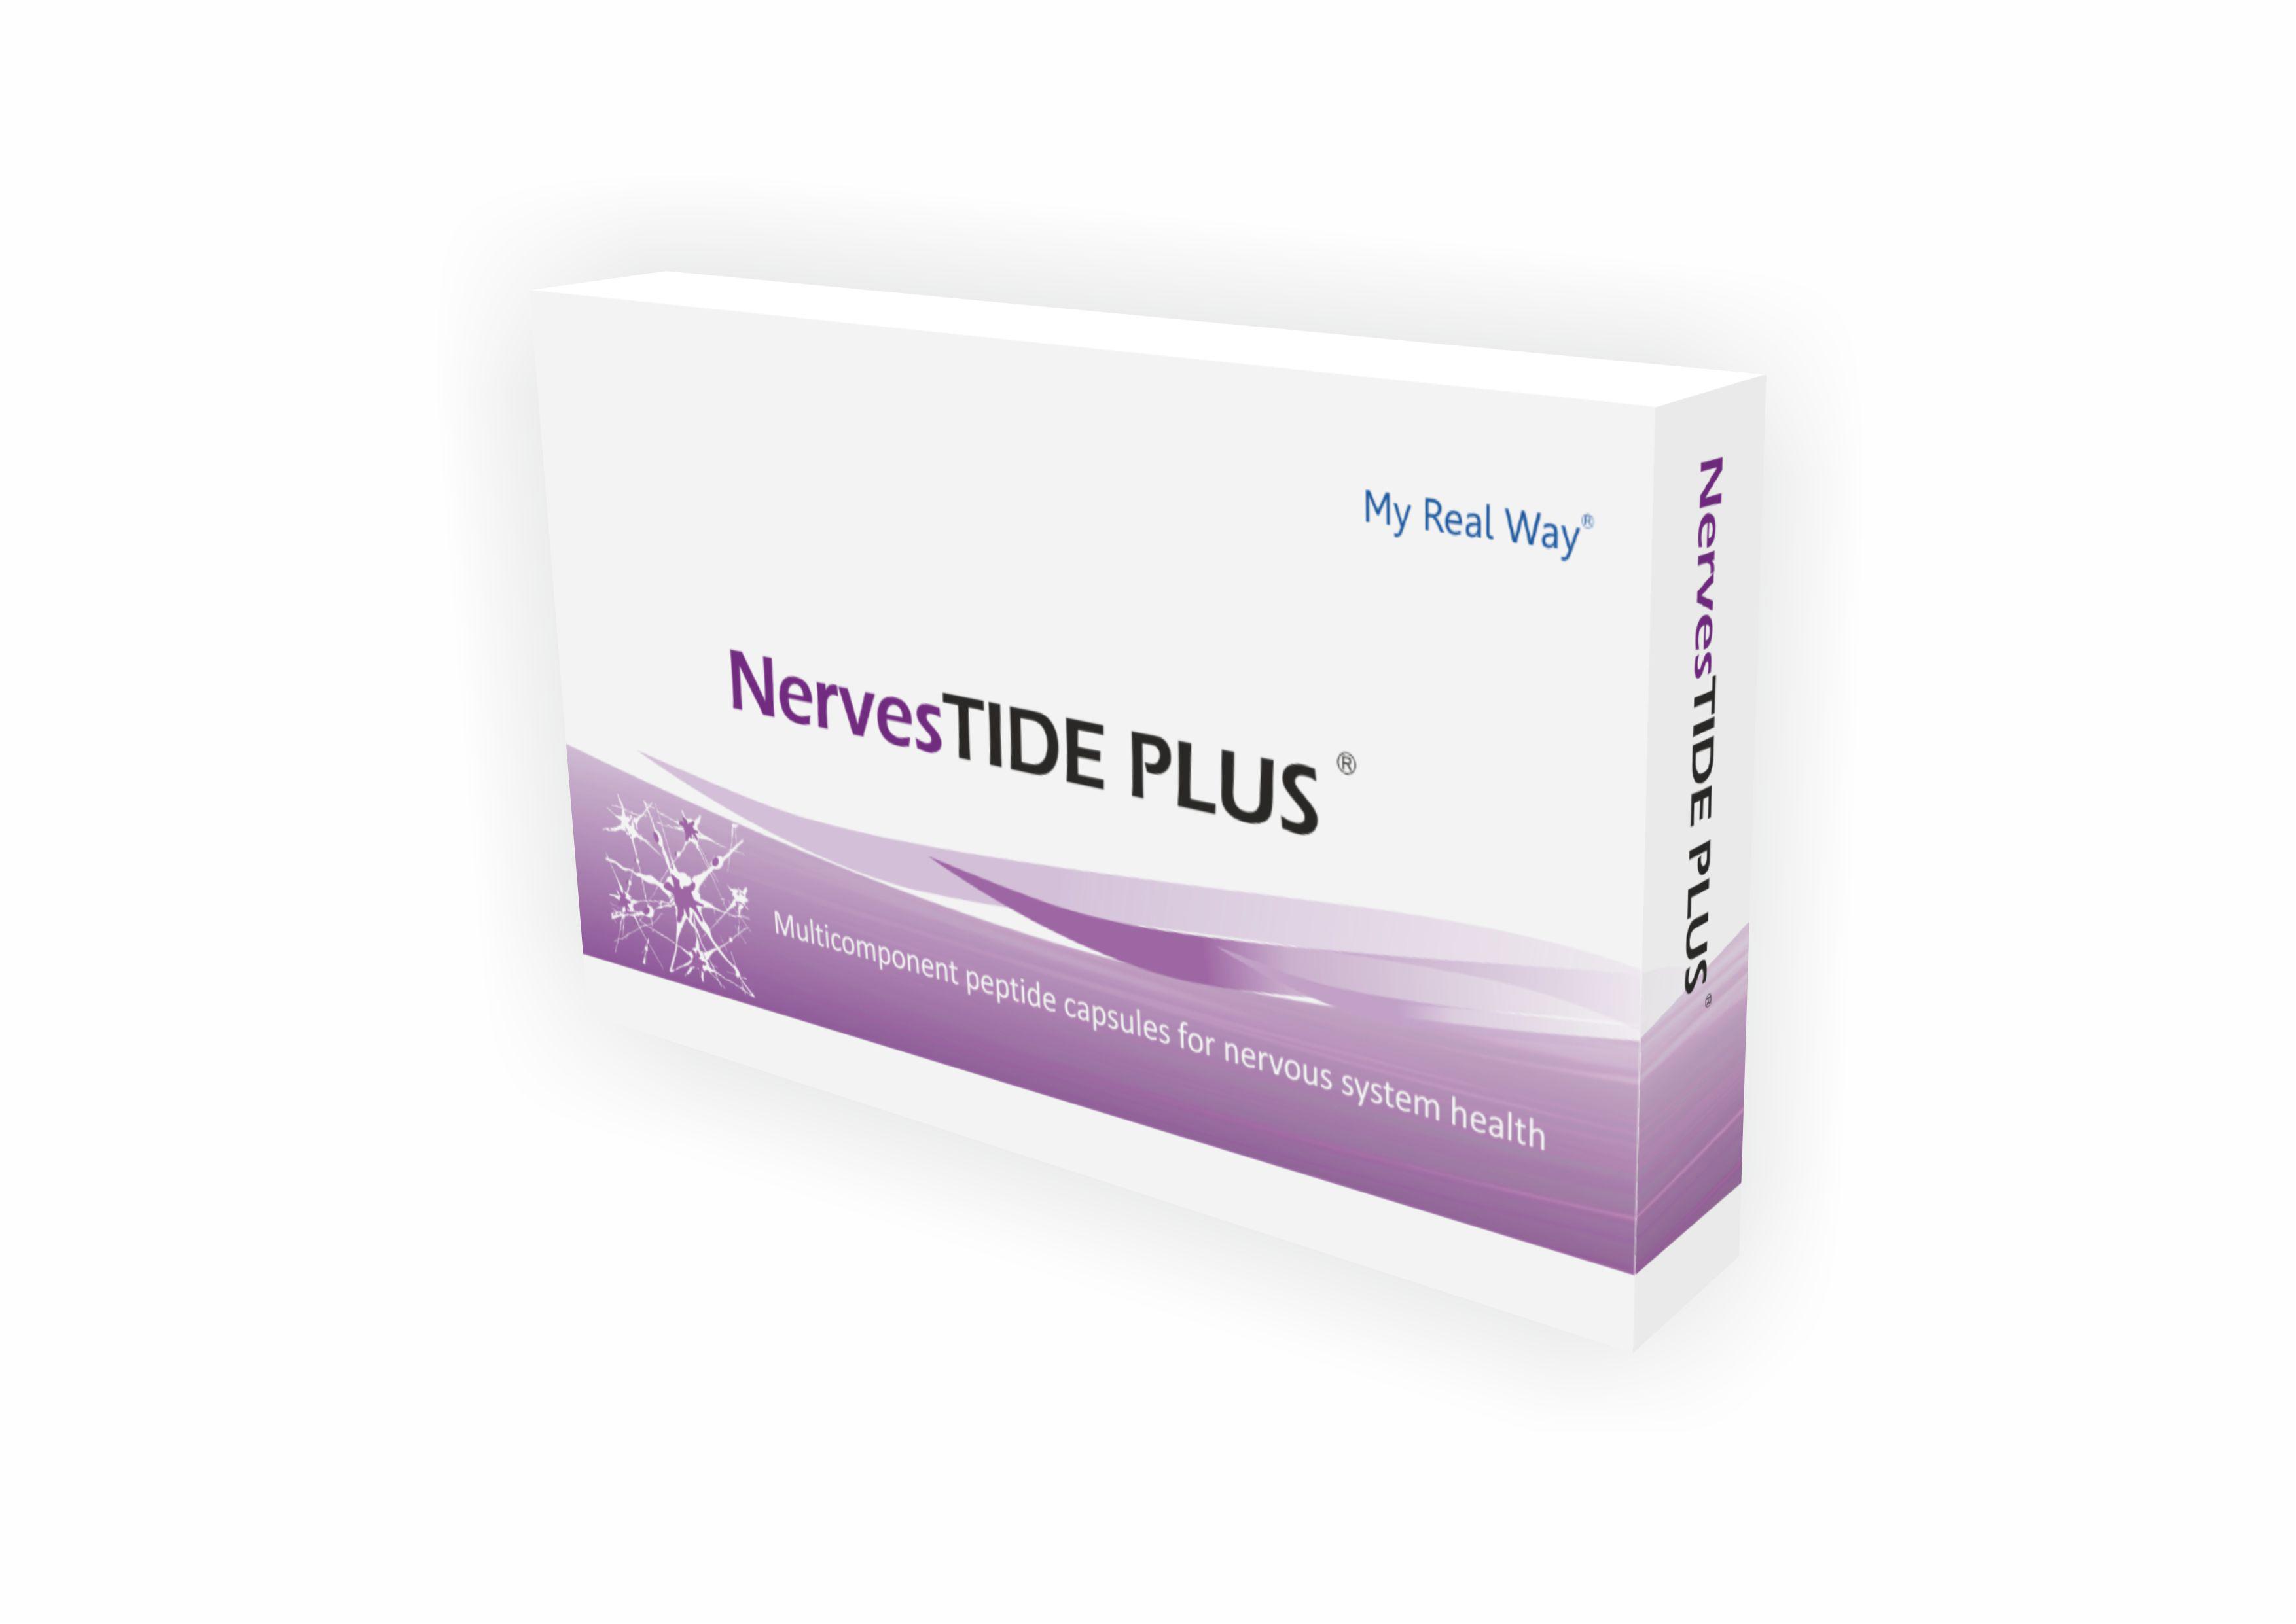 NervesTIDE PLUS